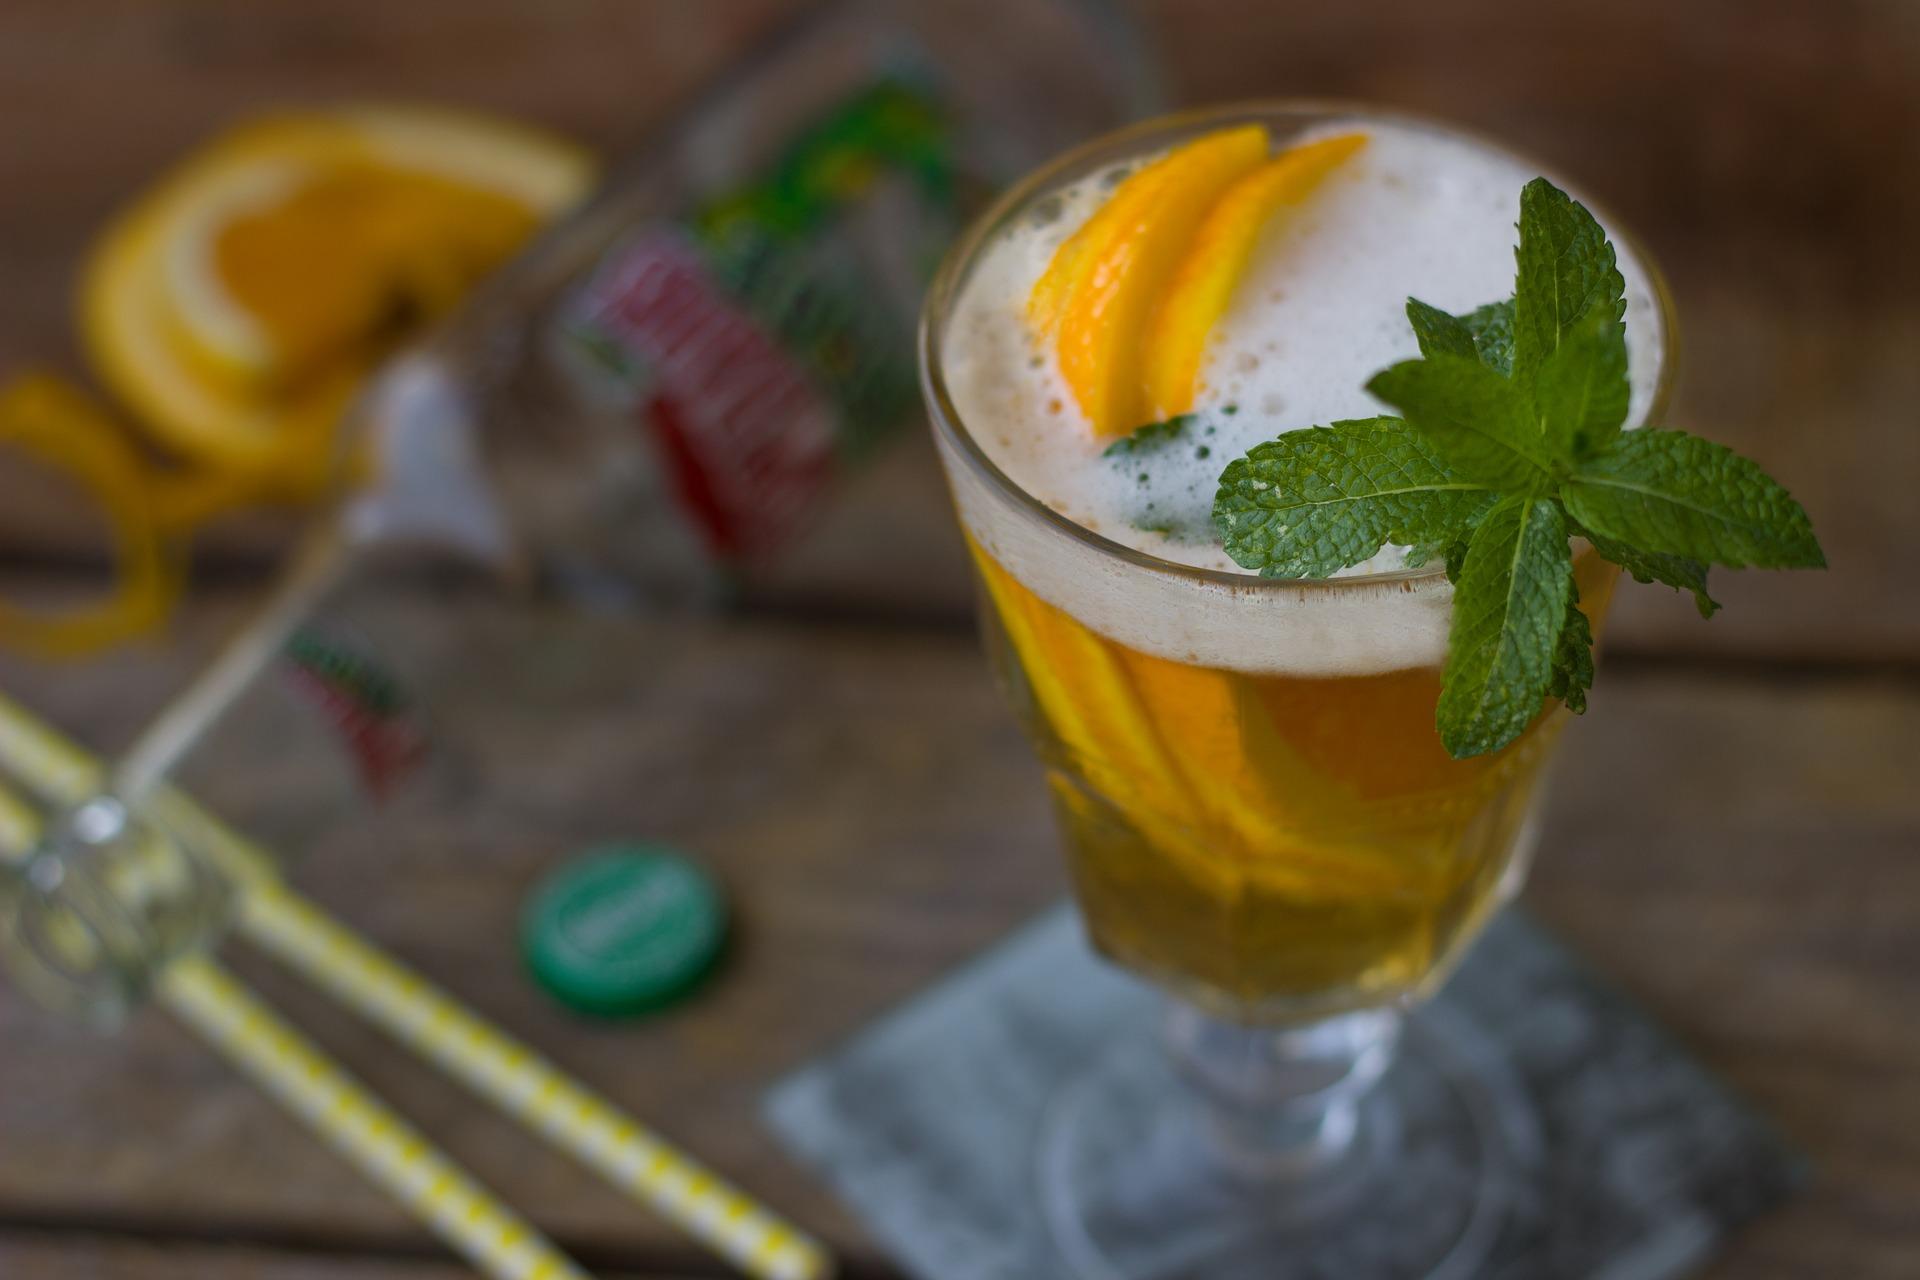 Pixabay/Bernadette Wurzinger: Determination of Rebaudioside A in Mixed beer, Beer-based Beverages and Lemonades